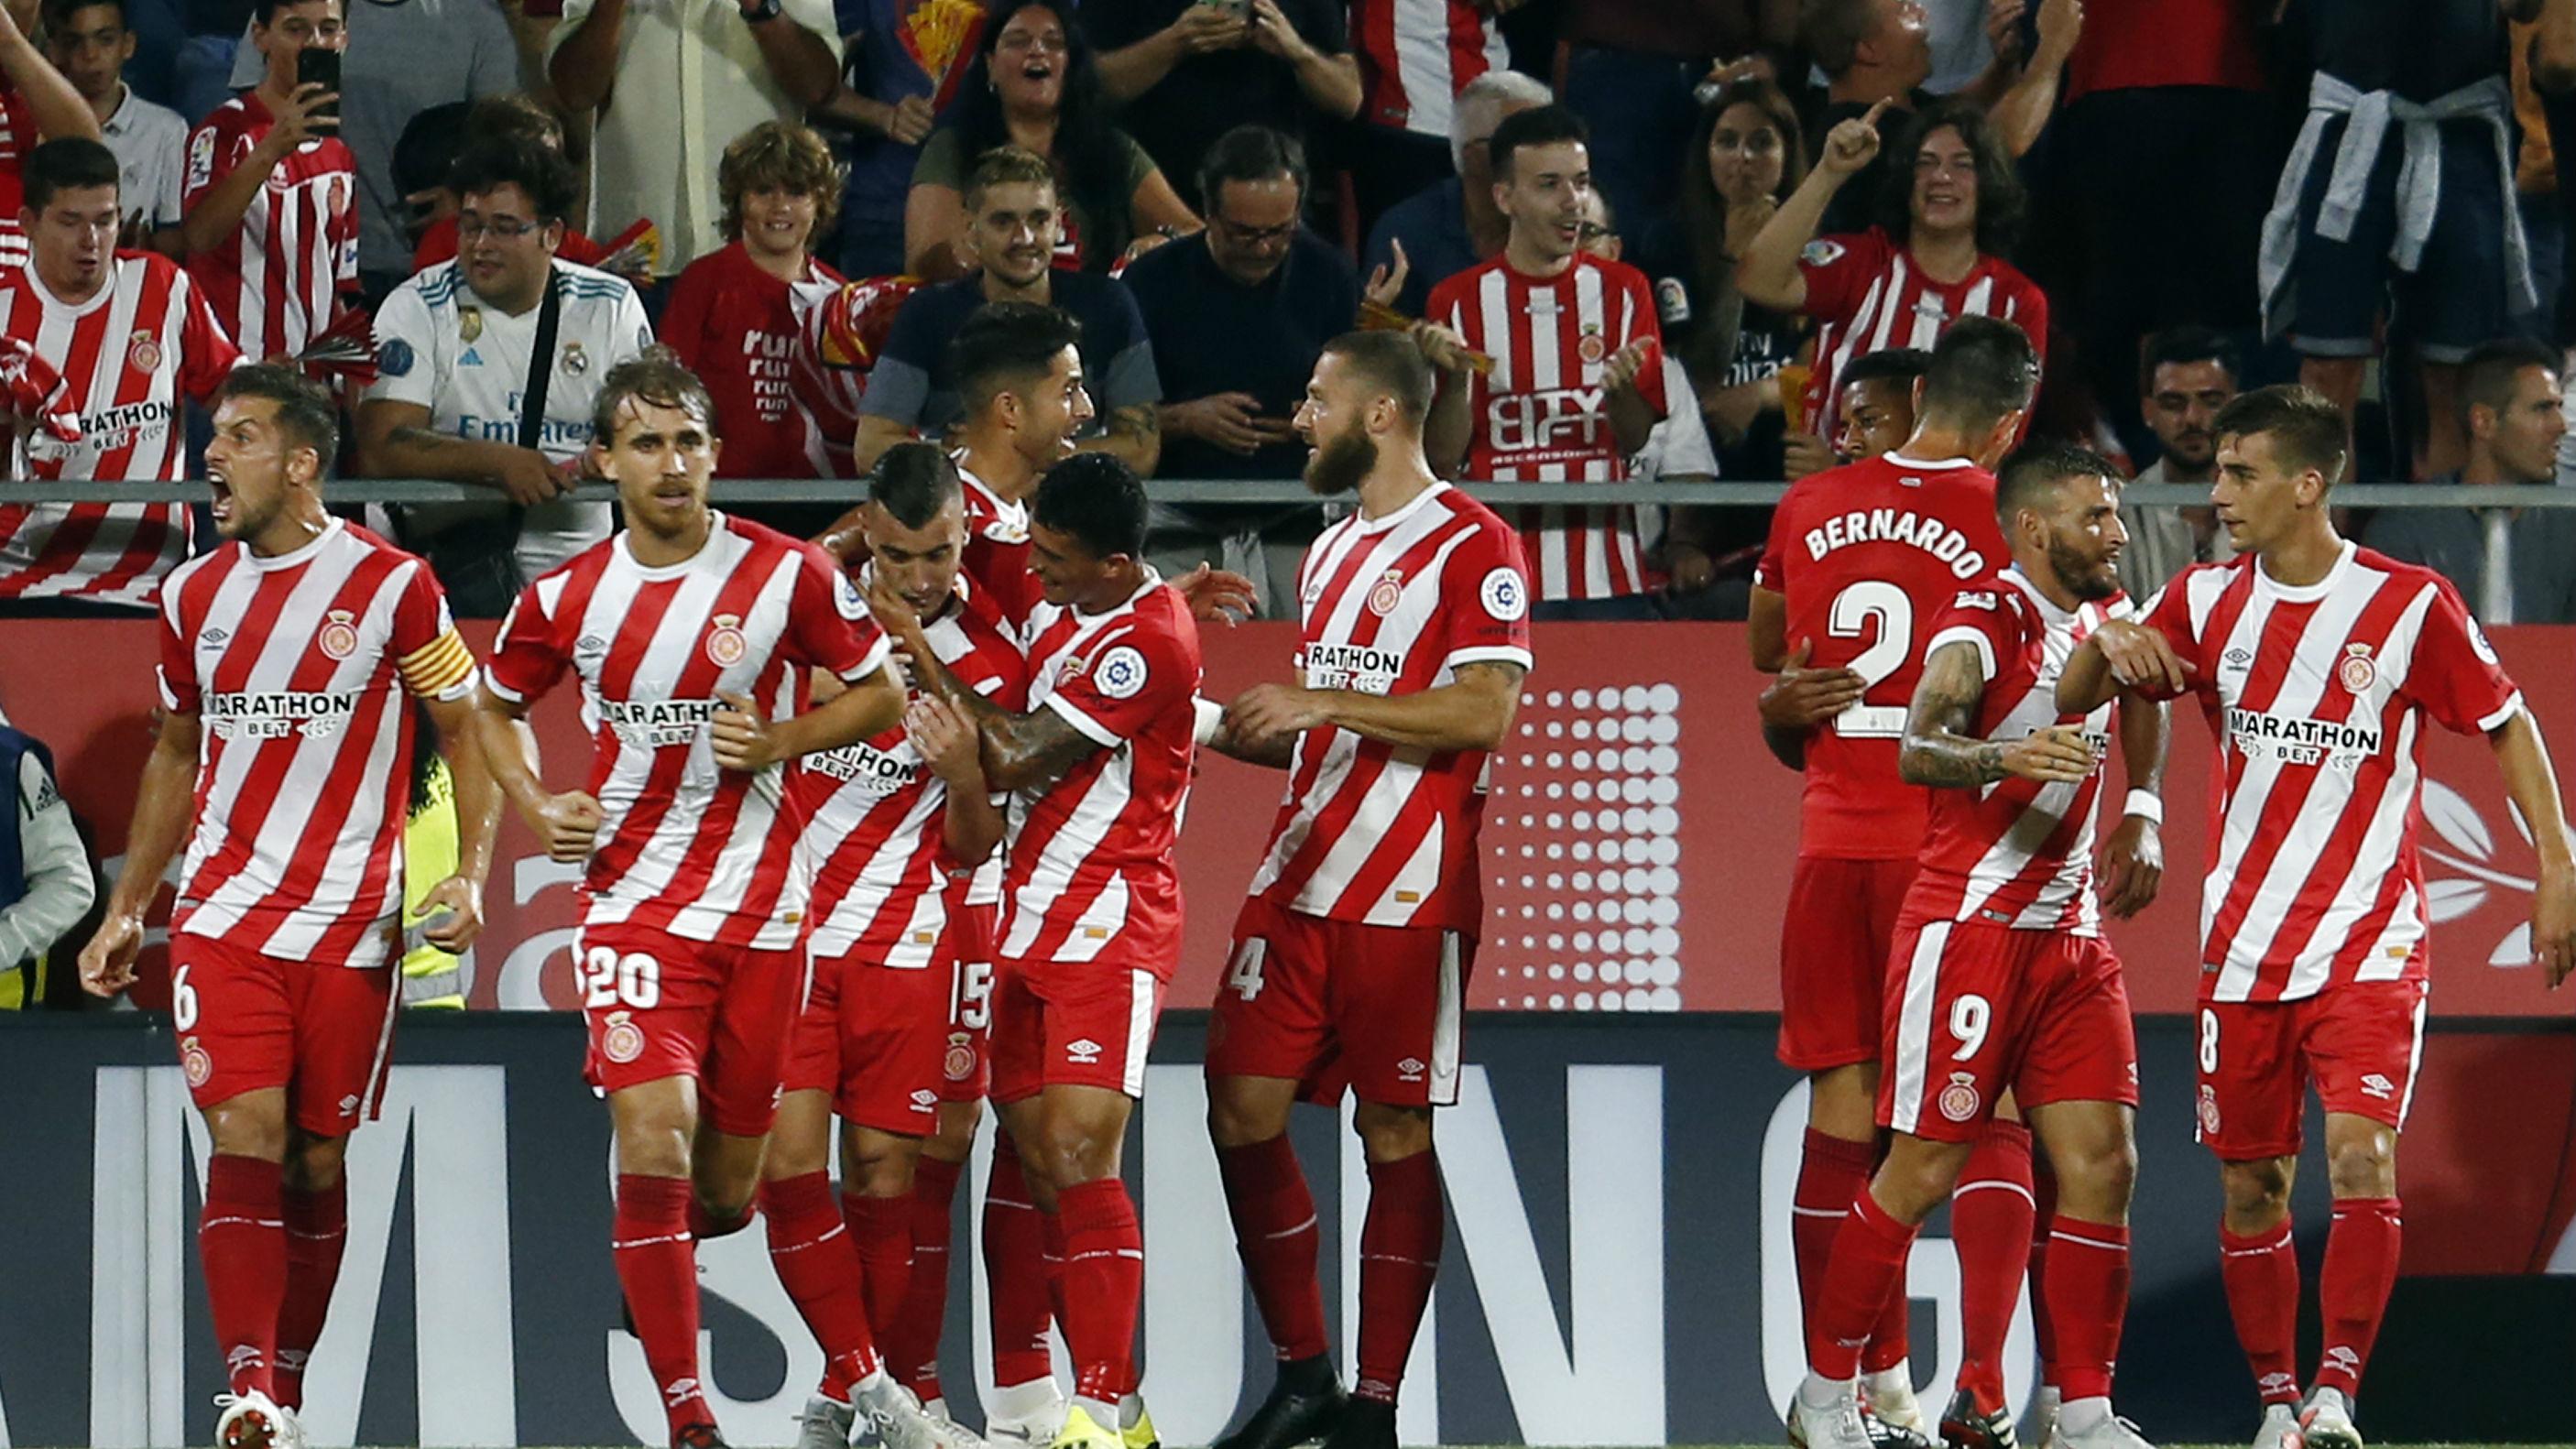 Girona Real Madrid 26/08